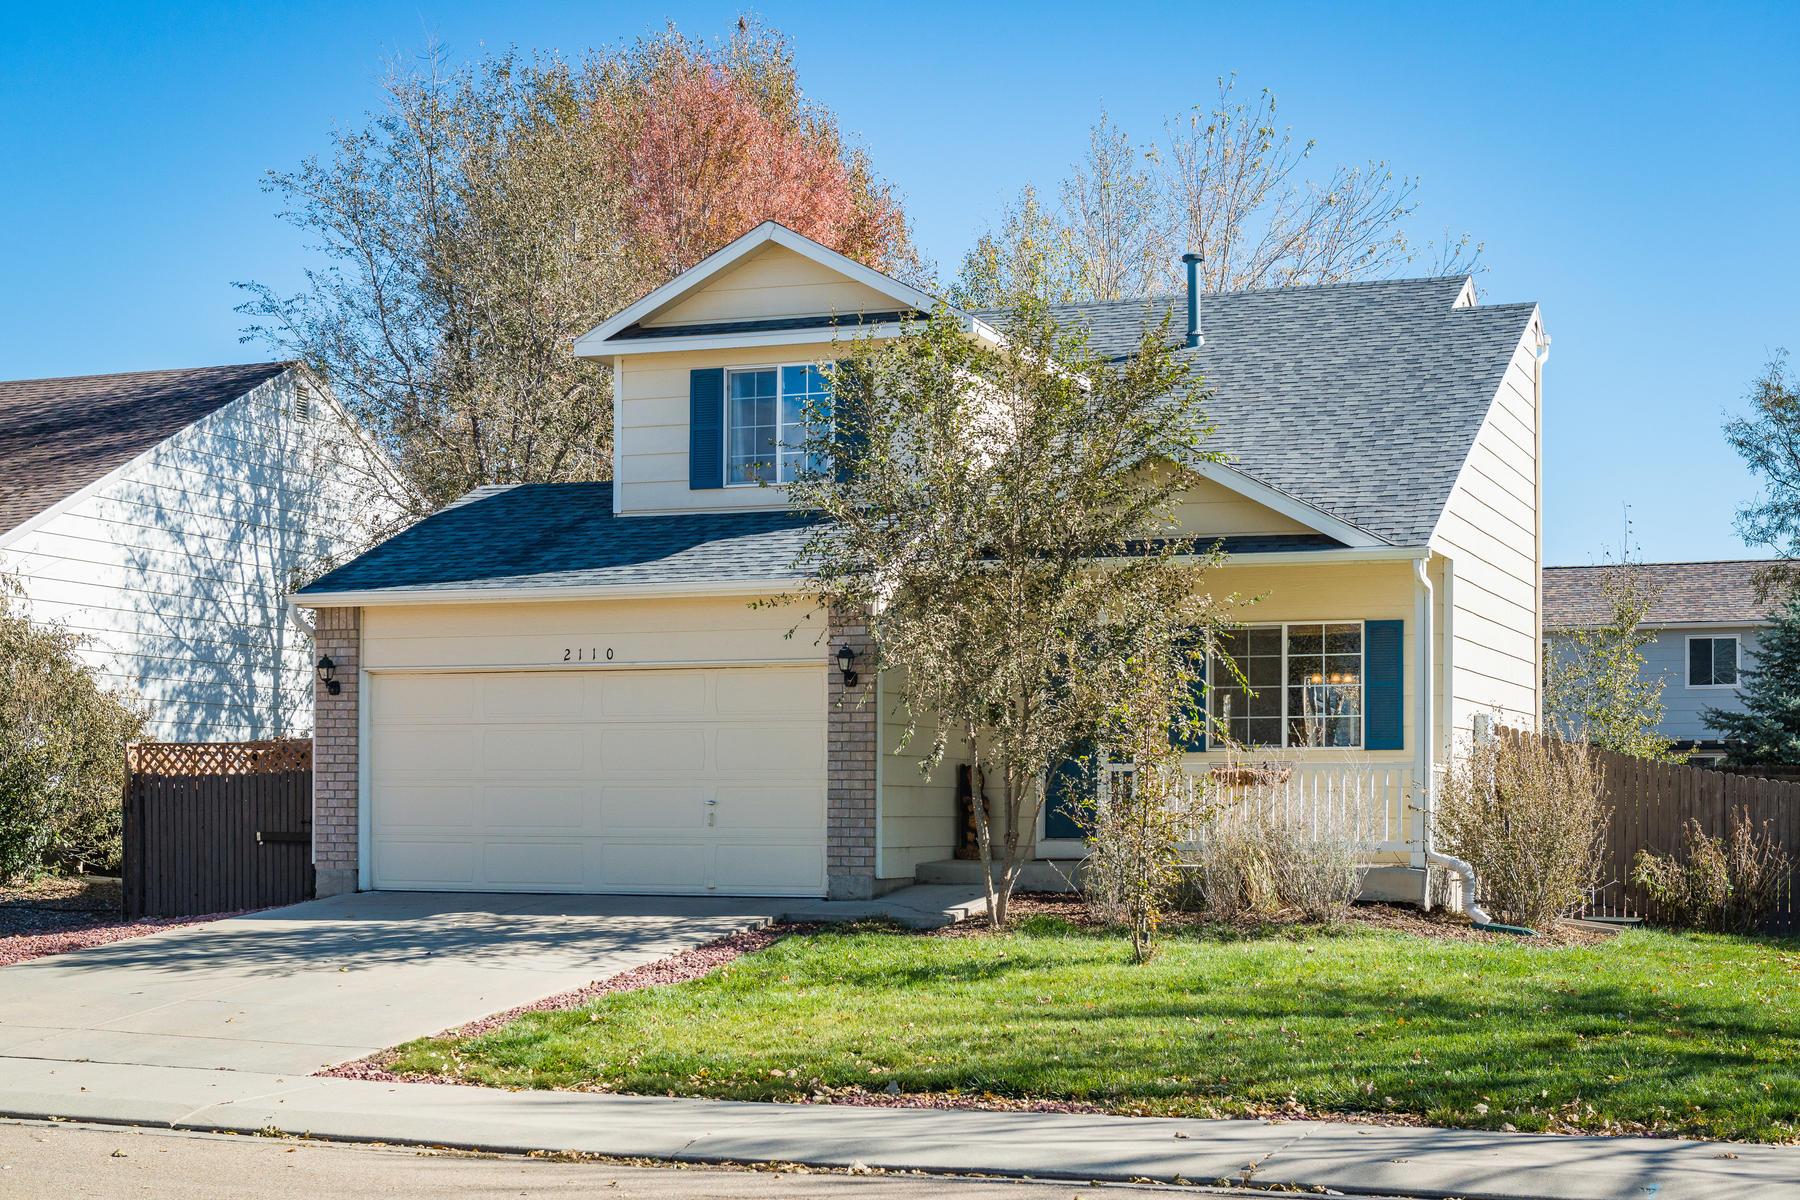 Single Family Home for Active at 2110 Astoria Lane 2110 Astoria Lane Longmont, Colorado 80504 United States